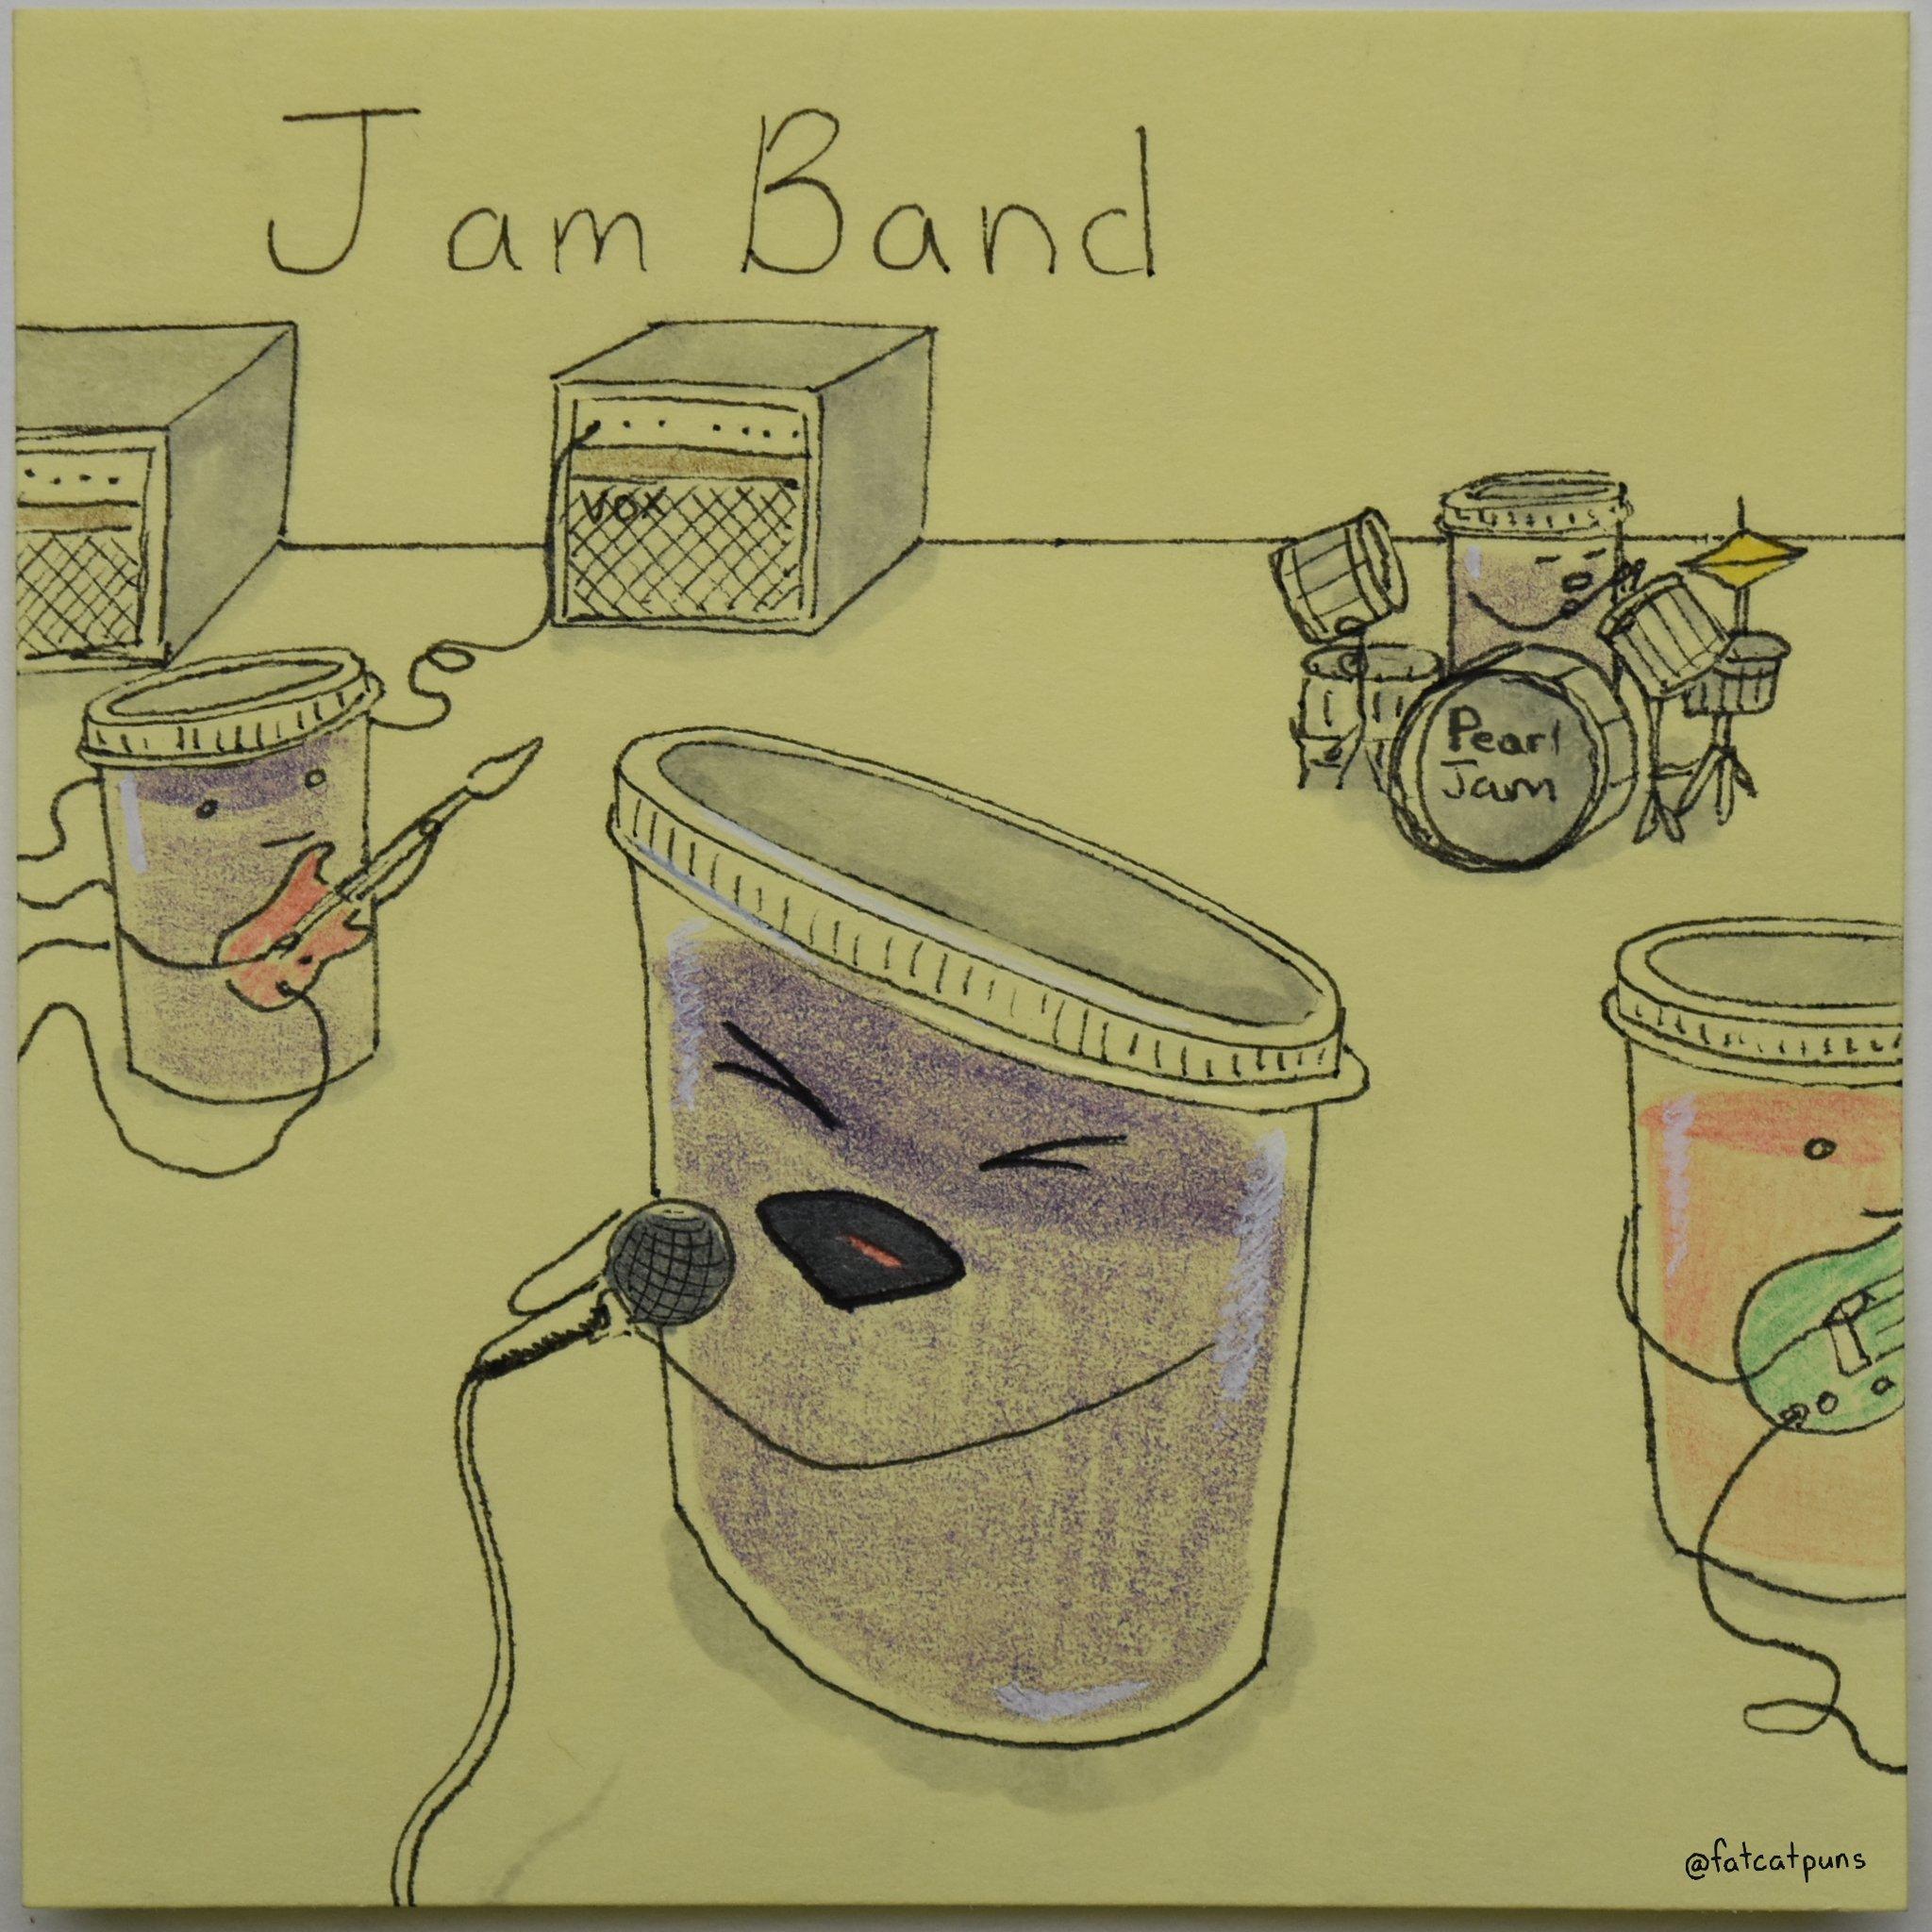 More of a #marmalade guy personally but to each there own  . . . #pearljam #pearljamfan #pearljamfamily #jam #jelly #grape #grapejam #stawberry #strawberryjam #preserves #band #jamband #jambands #jambandscene #guitarjam #drumjam #jamsession  #fatcatpuns #badpun #badpuns #badmeme https://t.co/1TcgxE5069